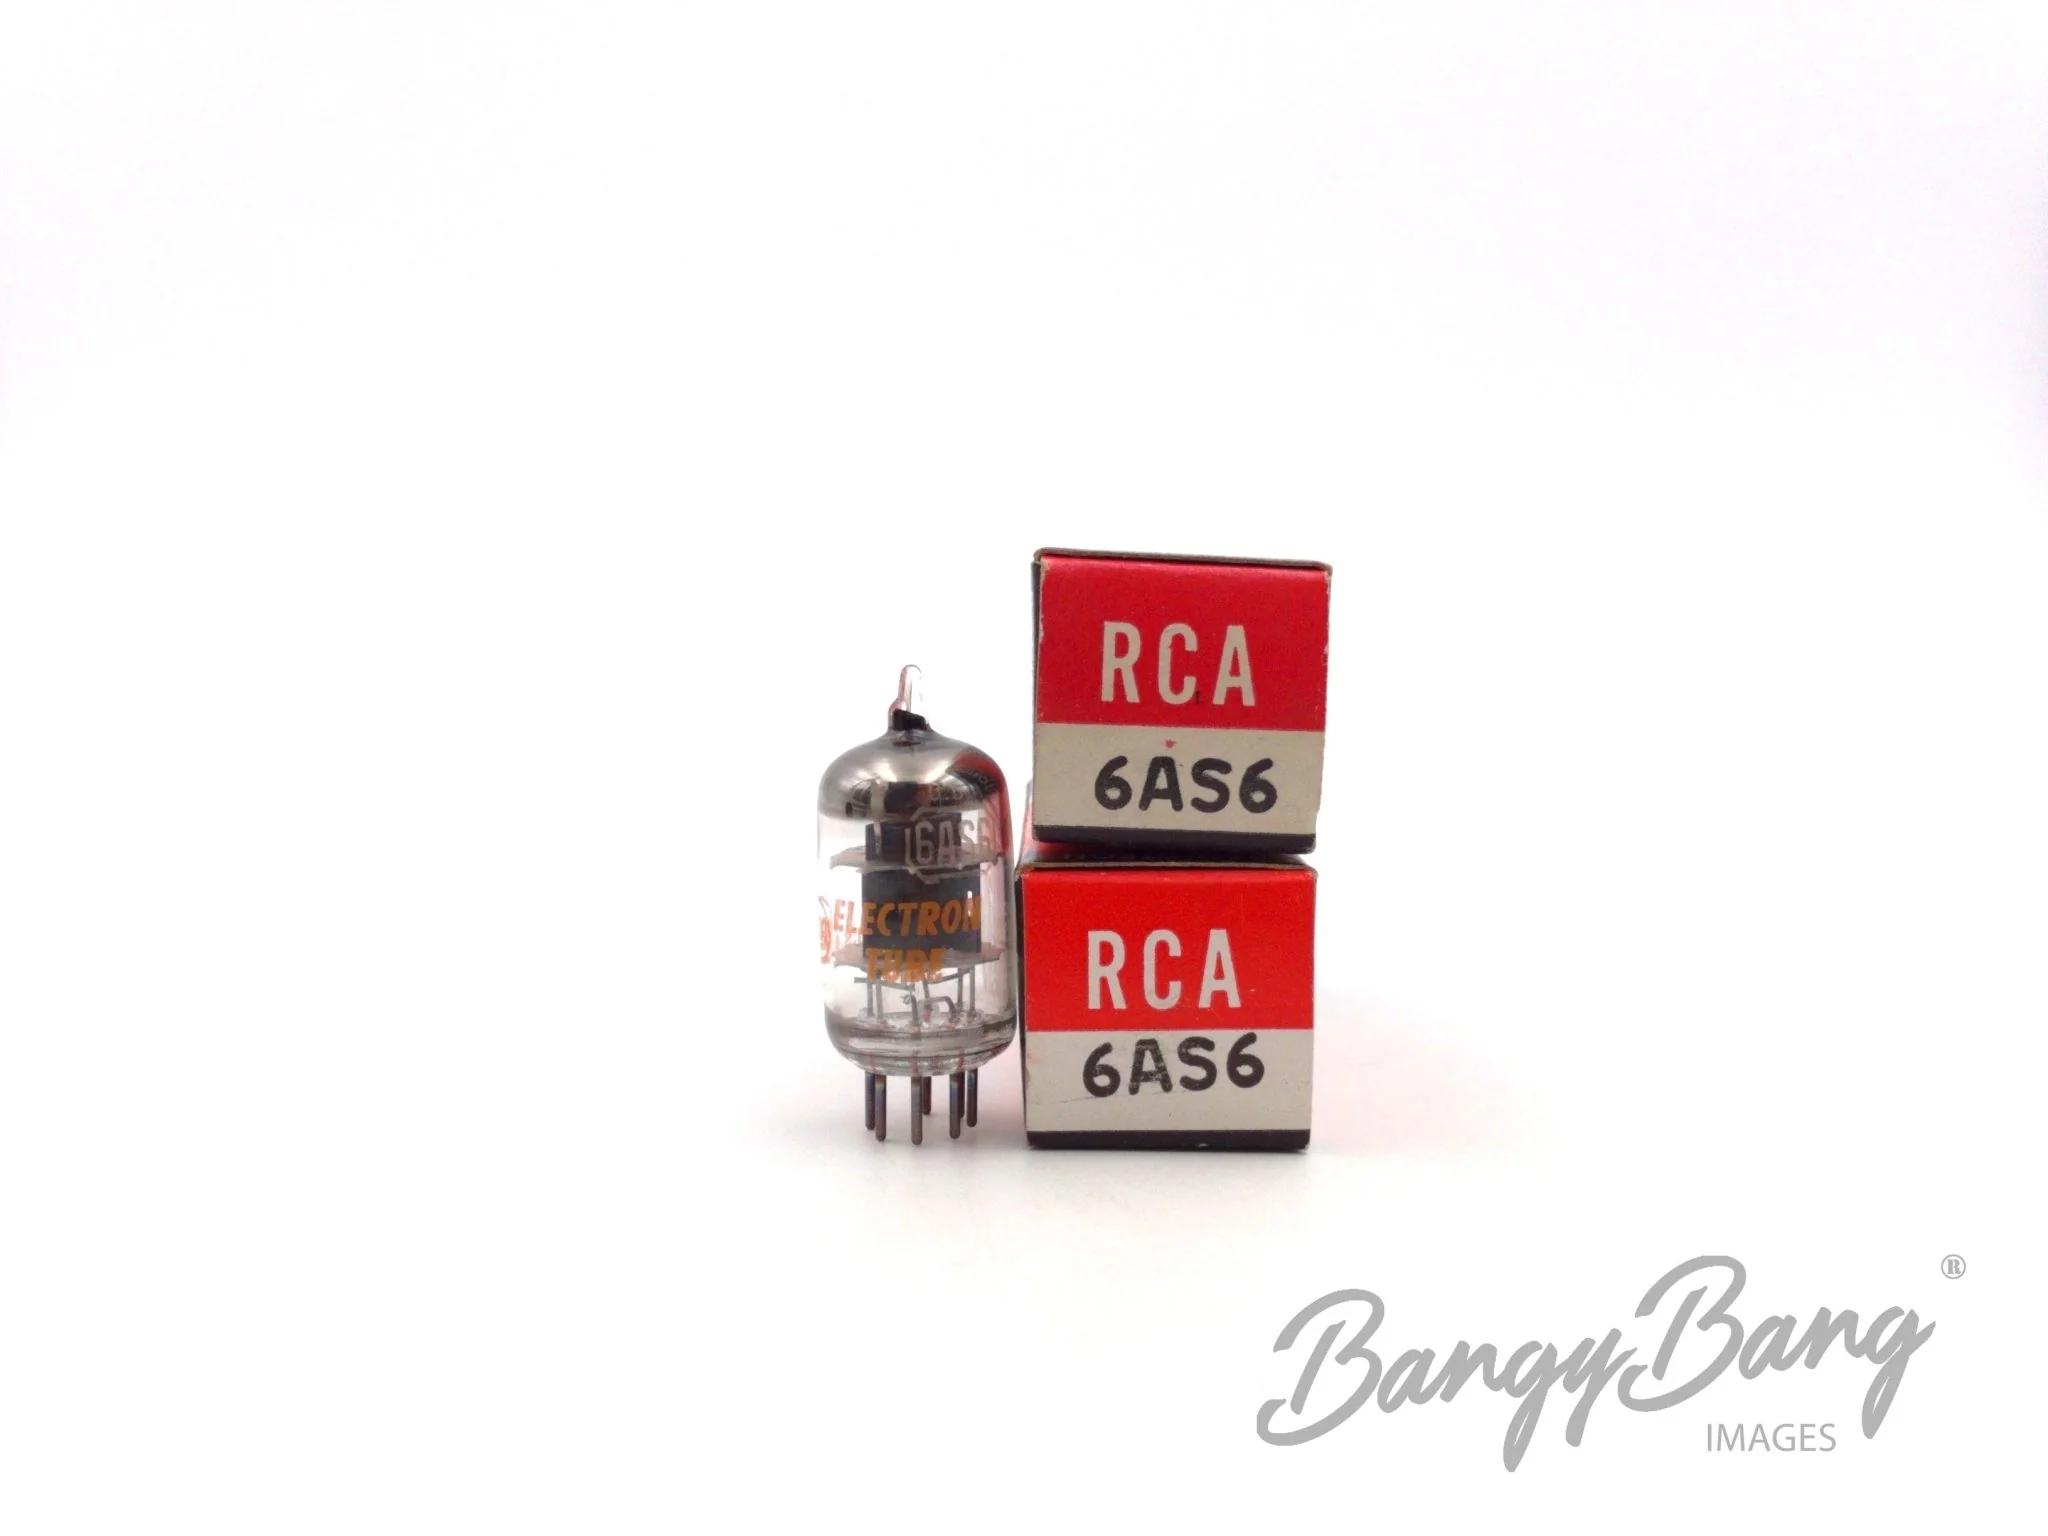 2 Vintage RCA 1T6 Subminiature Diode Pentode Detector Amplifier Valve BangyBang Tubes